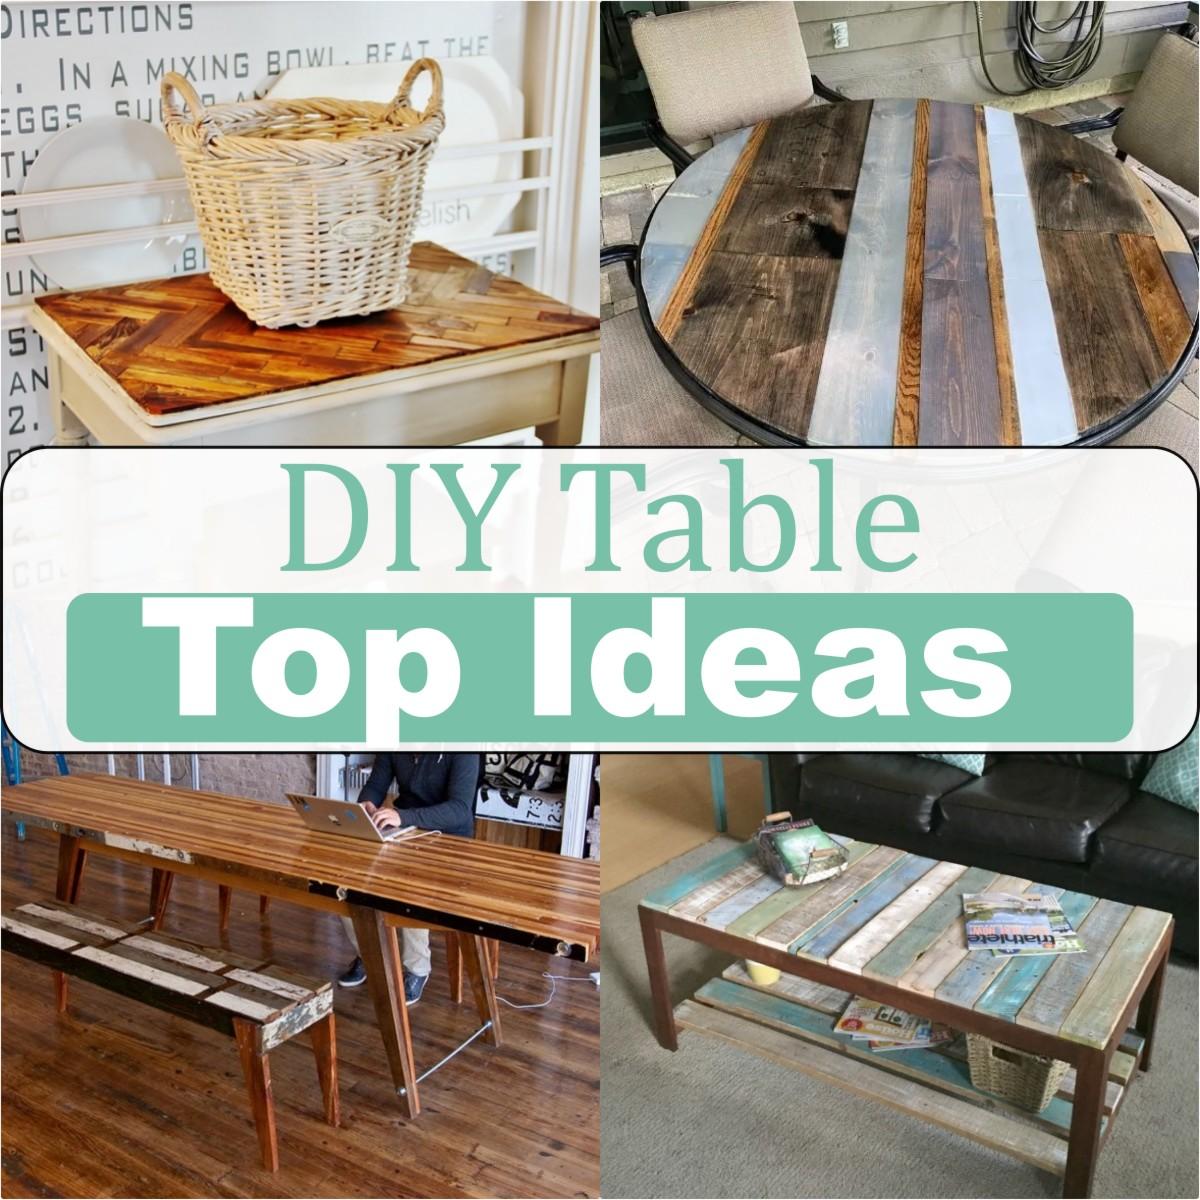 DIY Table Top Ideas